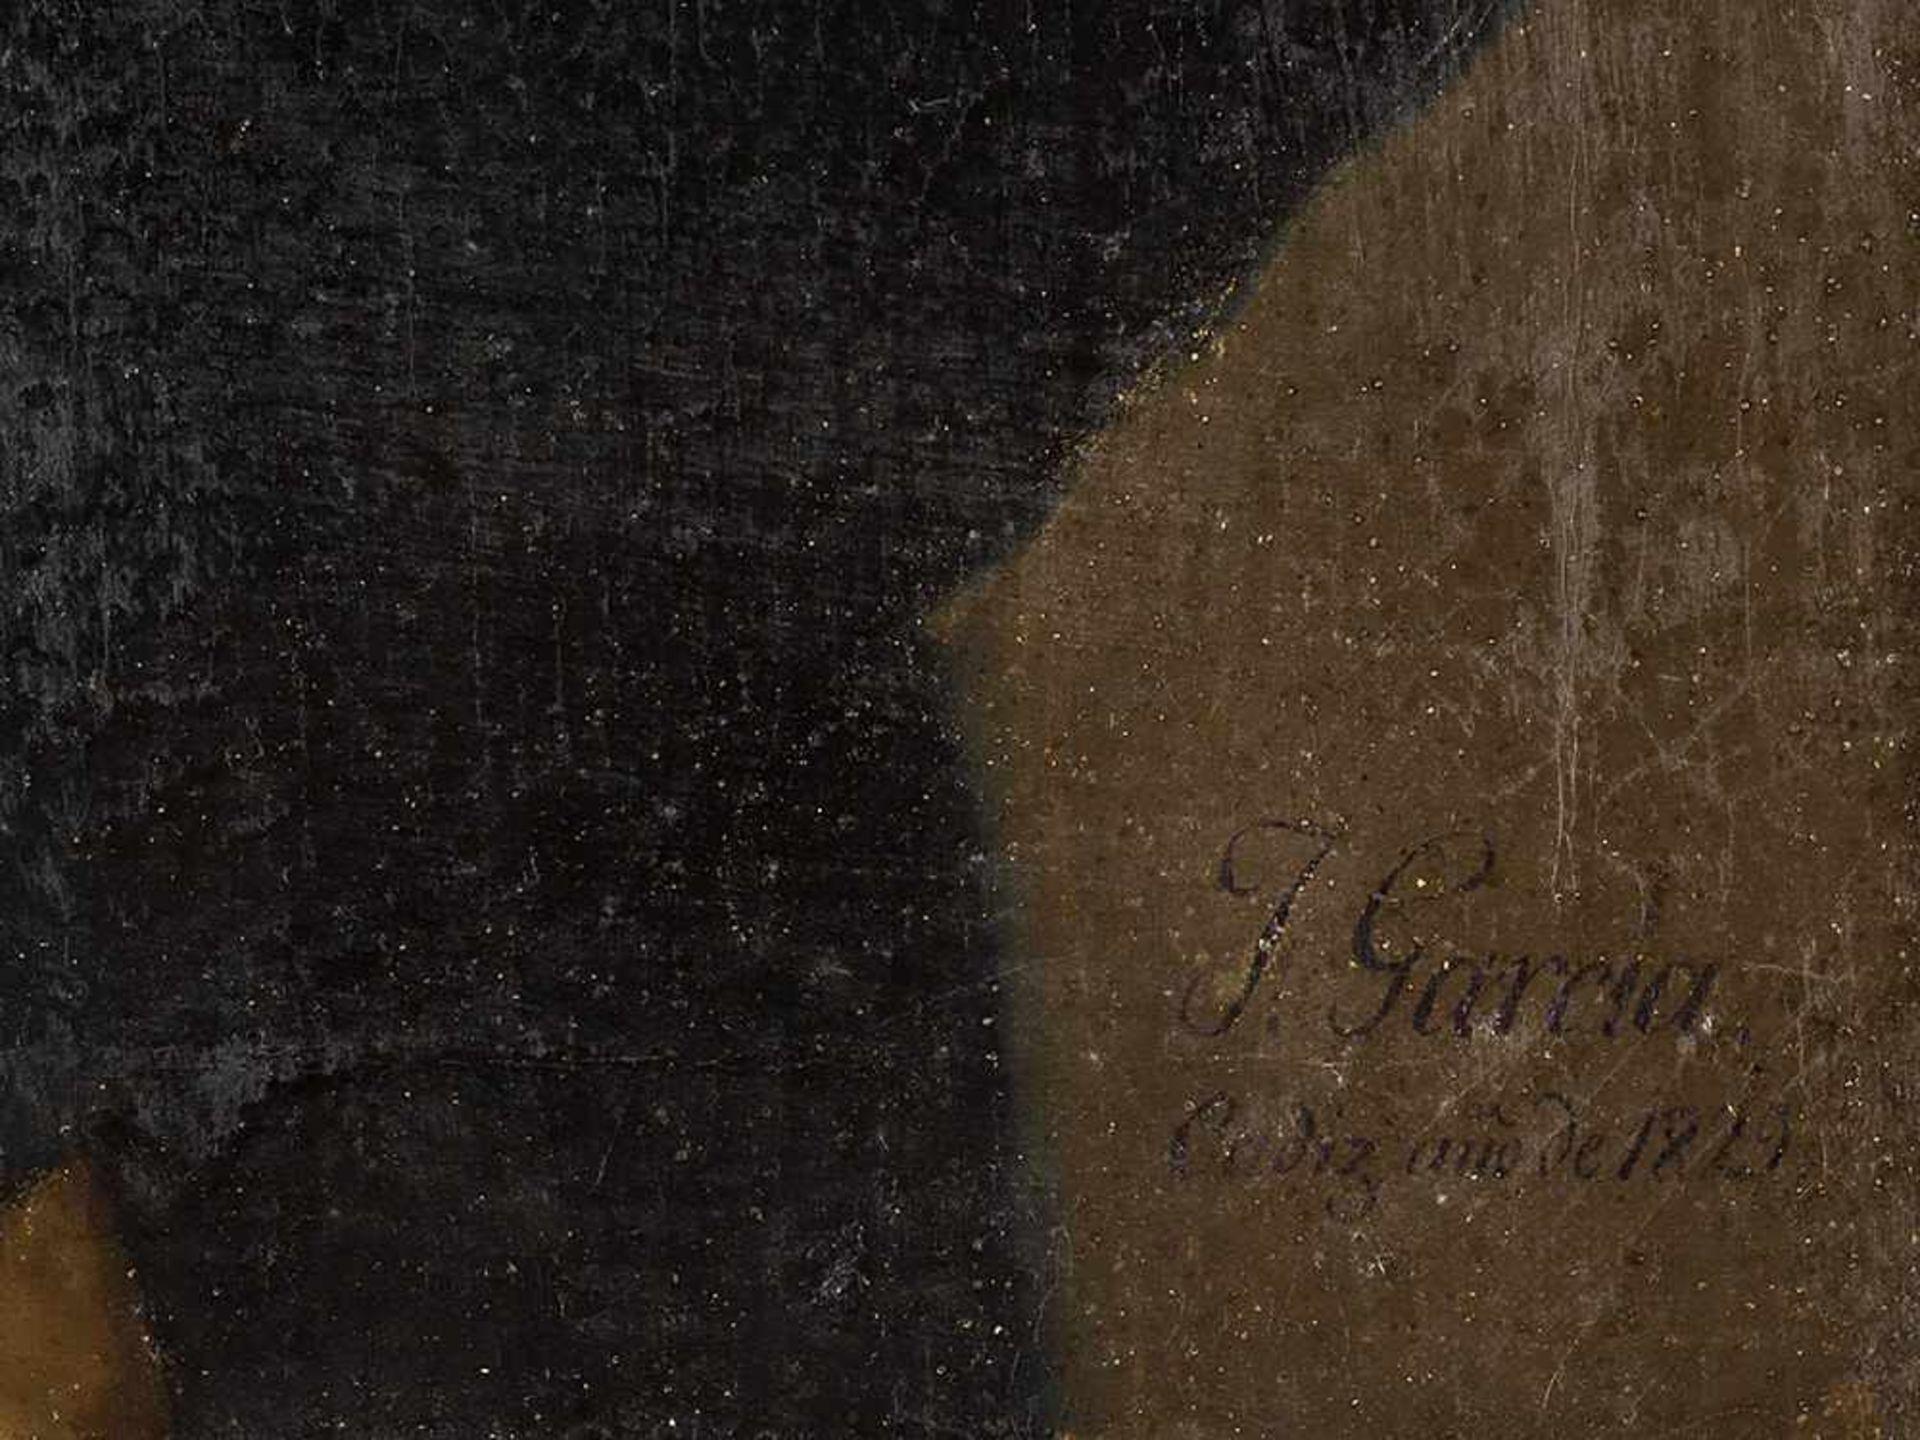 Los 64 - José Garcia Chicano (1775-1858), Porträt eines Herrn, Öl, 1829 Öl auf Leinwand. Spanien, Cádiz,